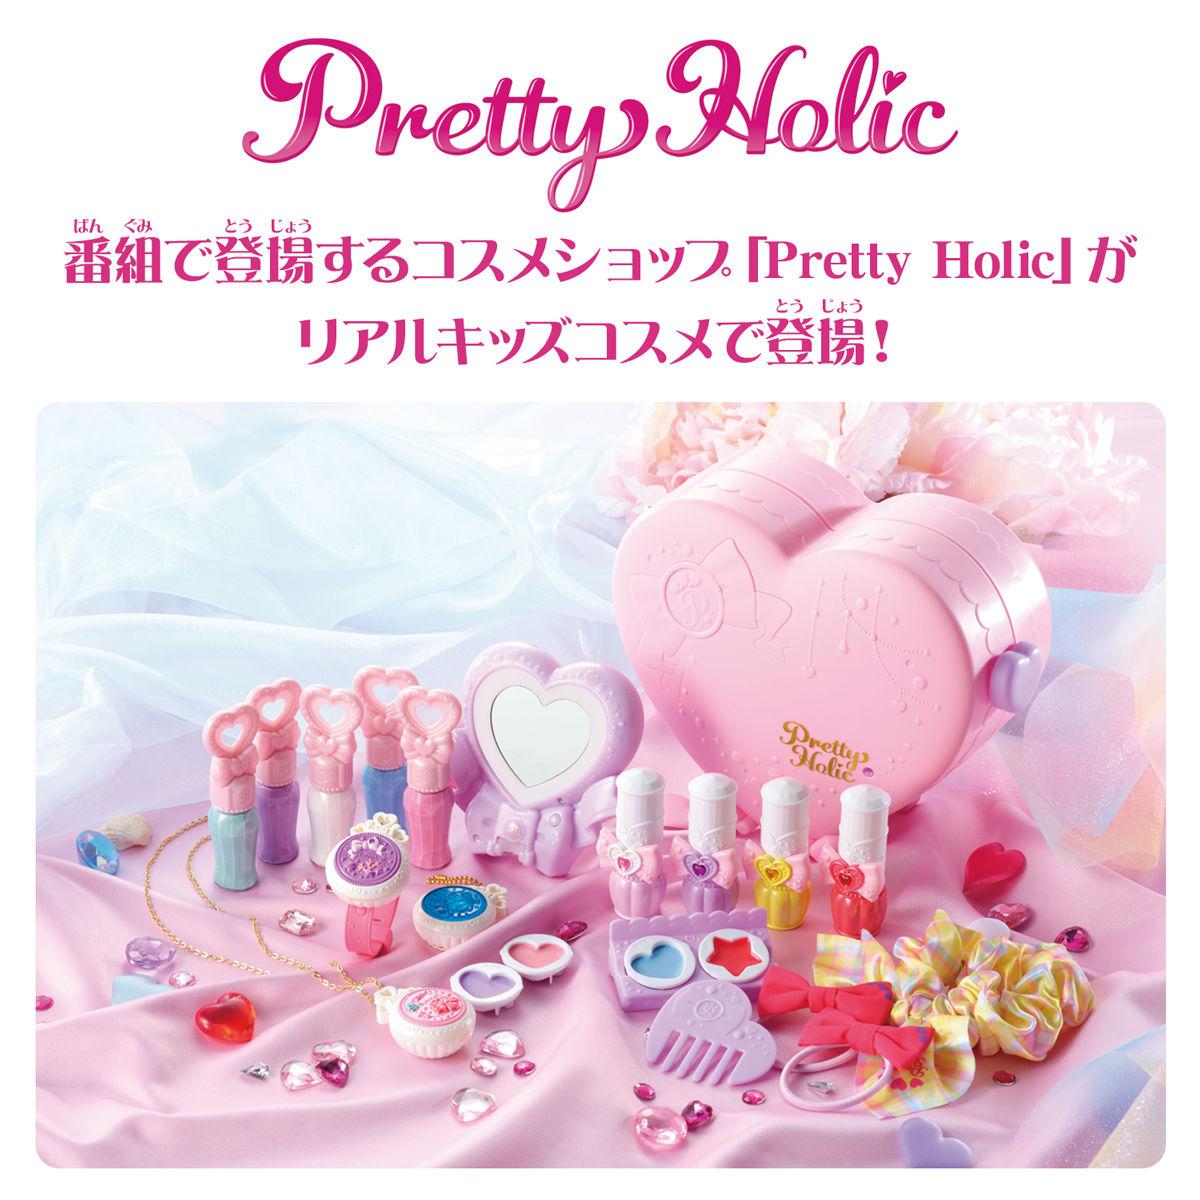 Pretty Holic プリティアップリップ キュアサマー